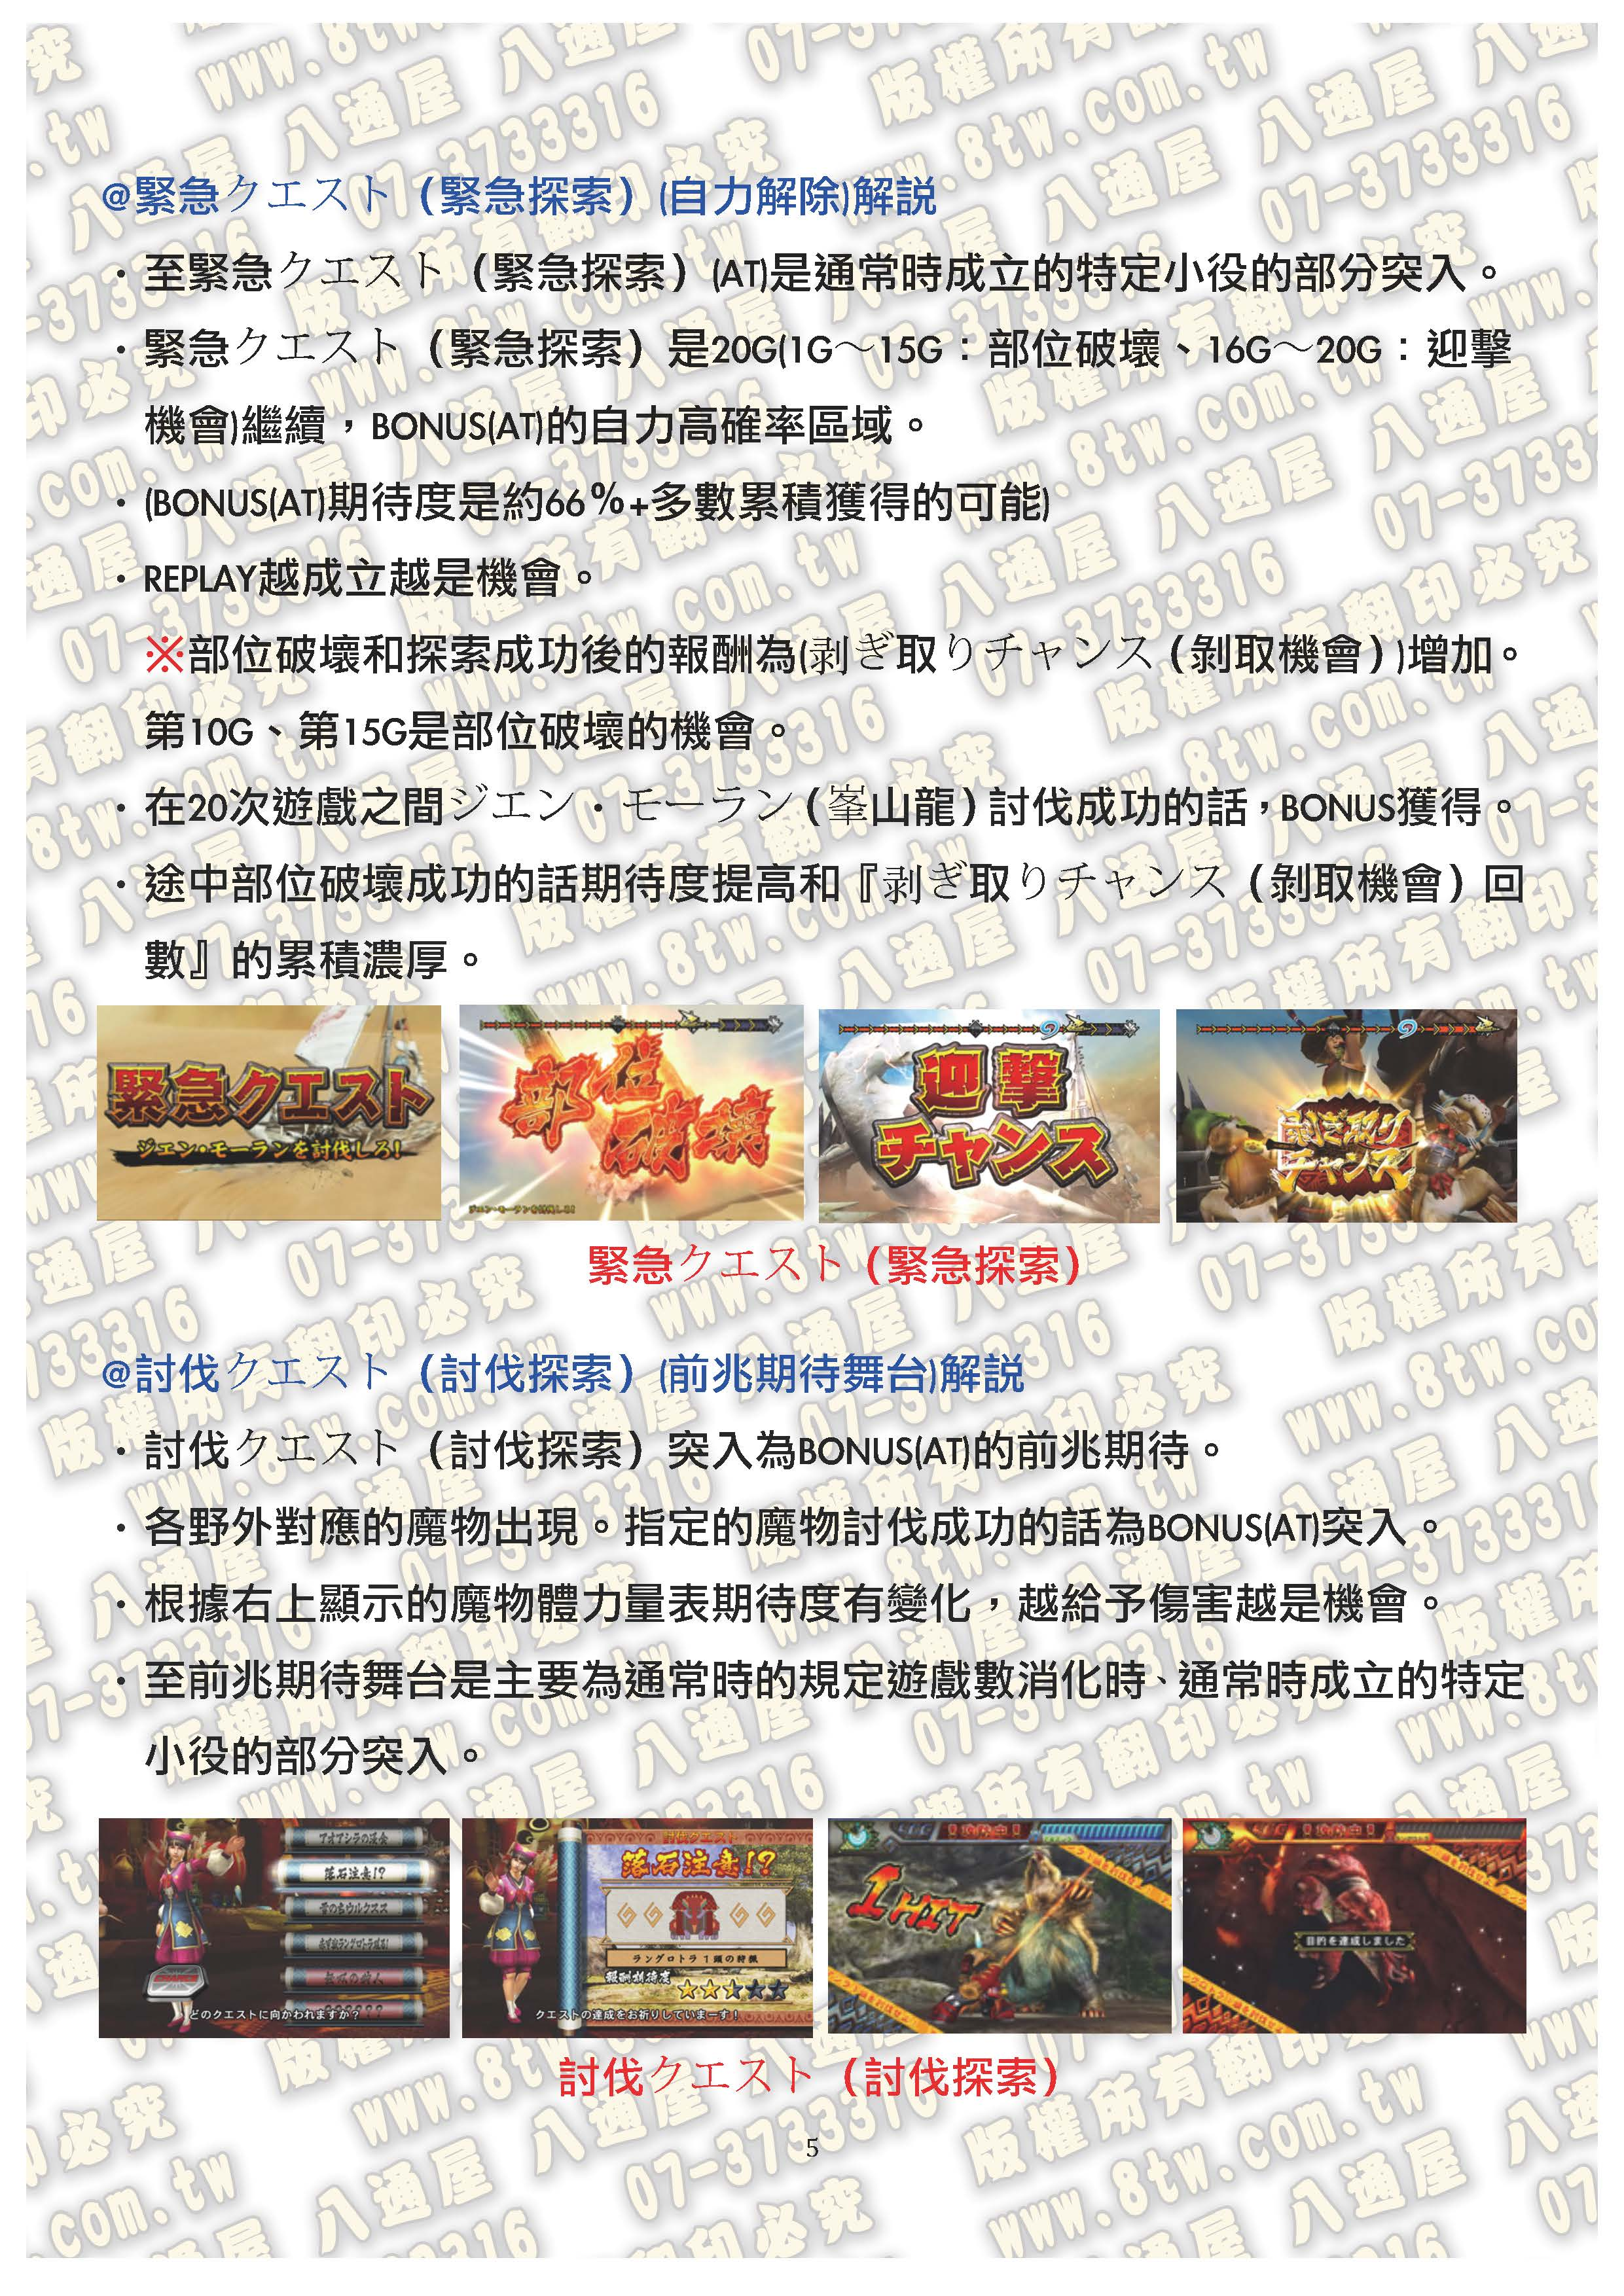 S0202魔物獵人 月下雷鳴 中文版攻略_Page_06